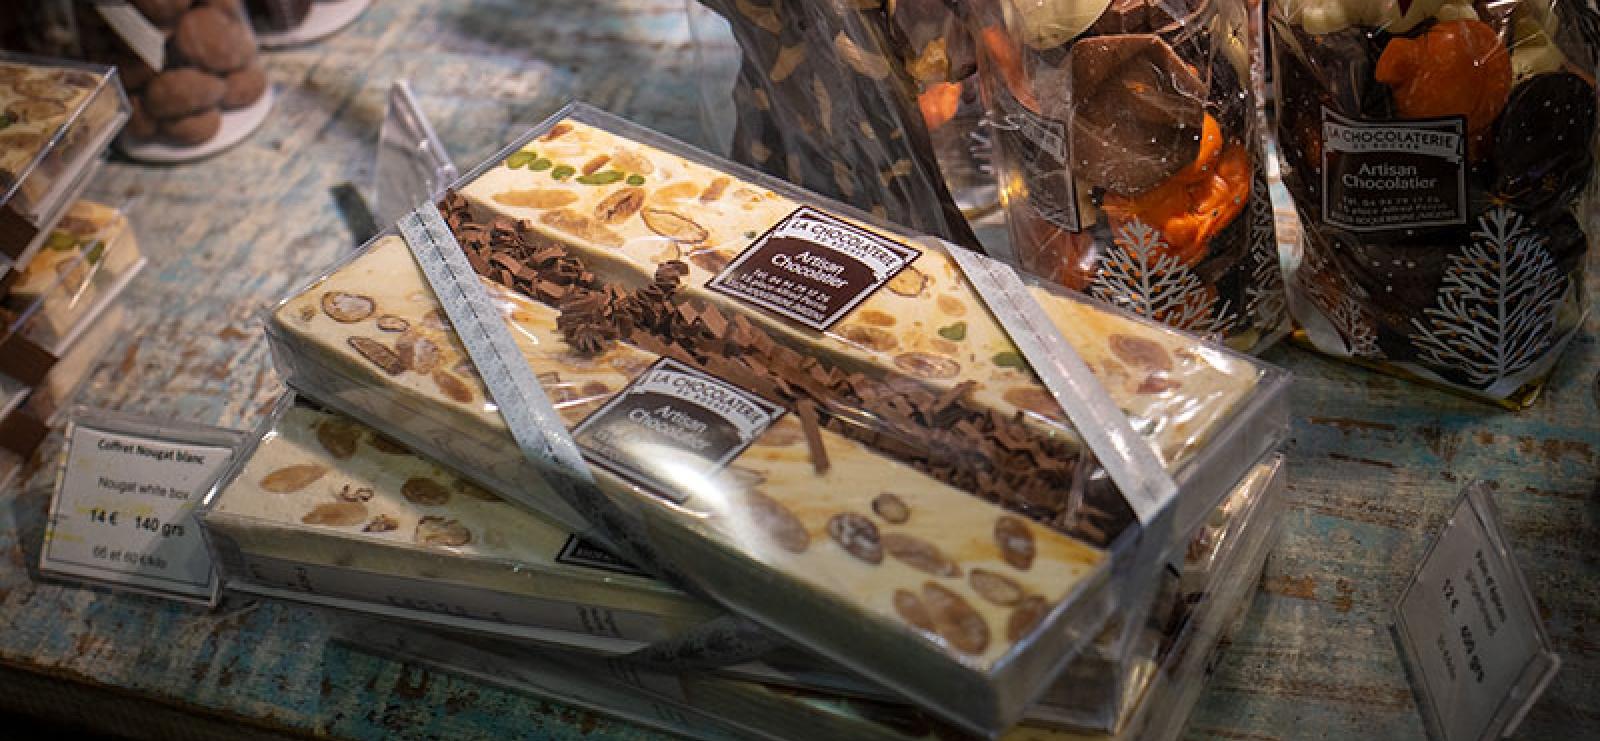 Rencontre avec un artisan Chocolatier